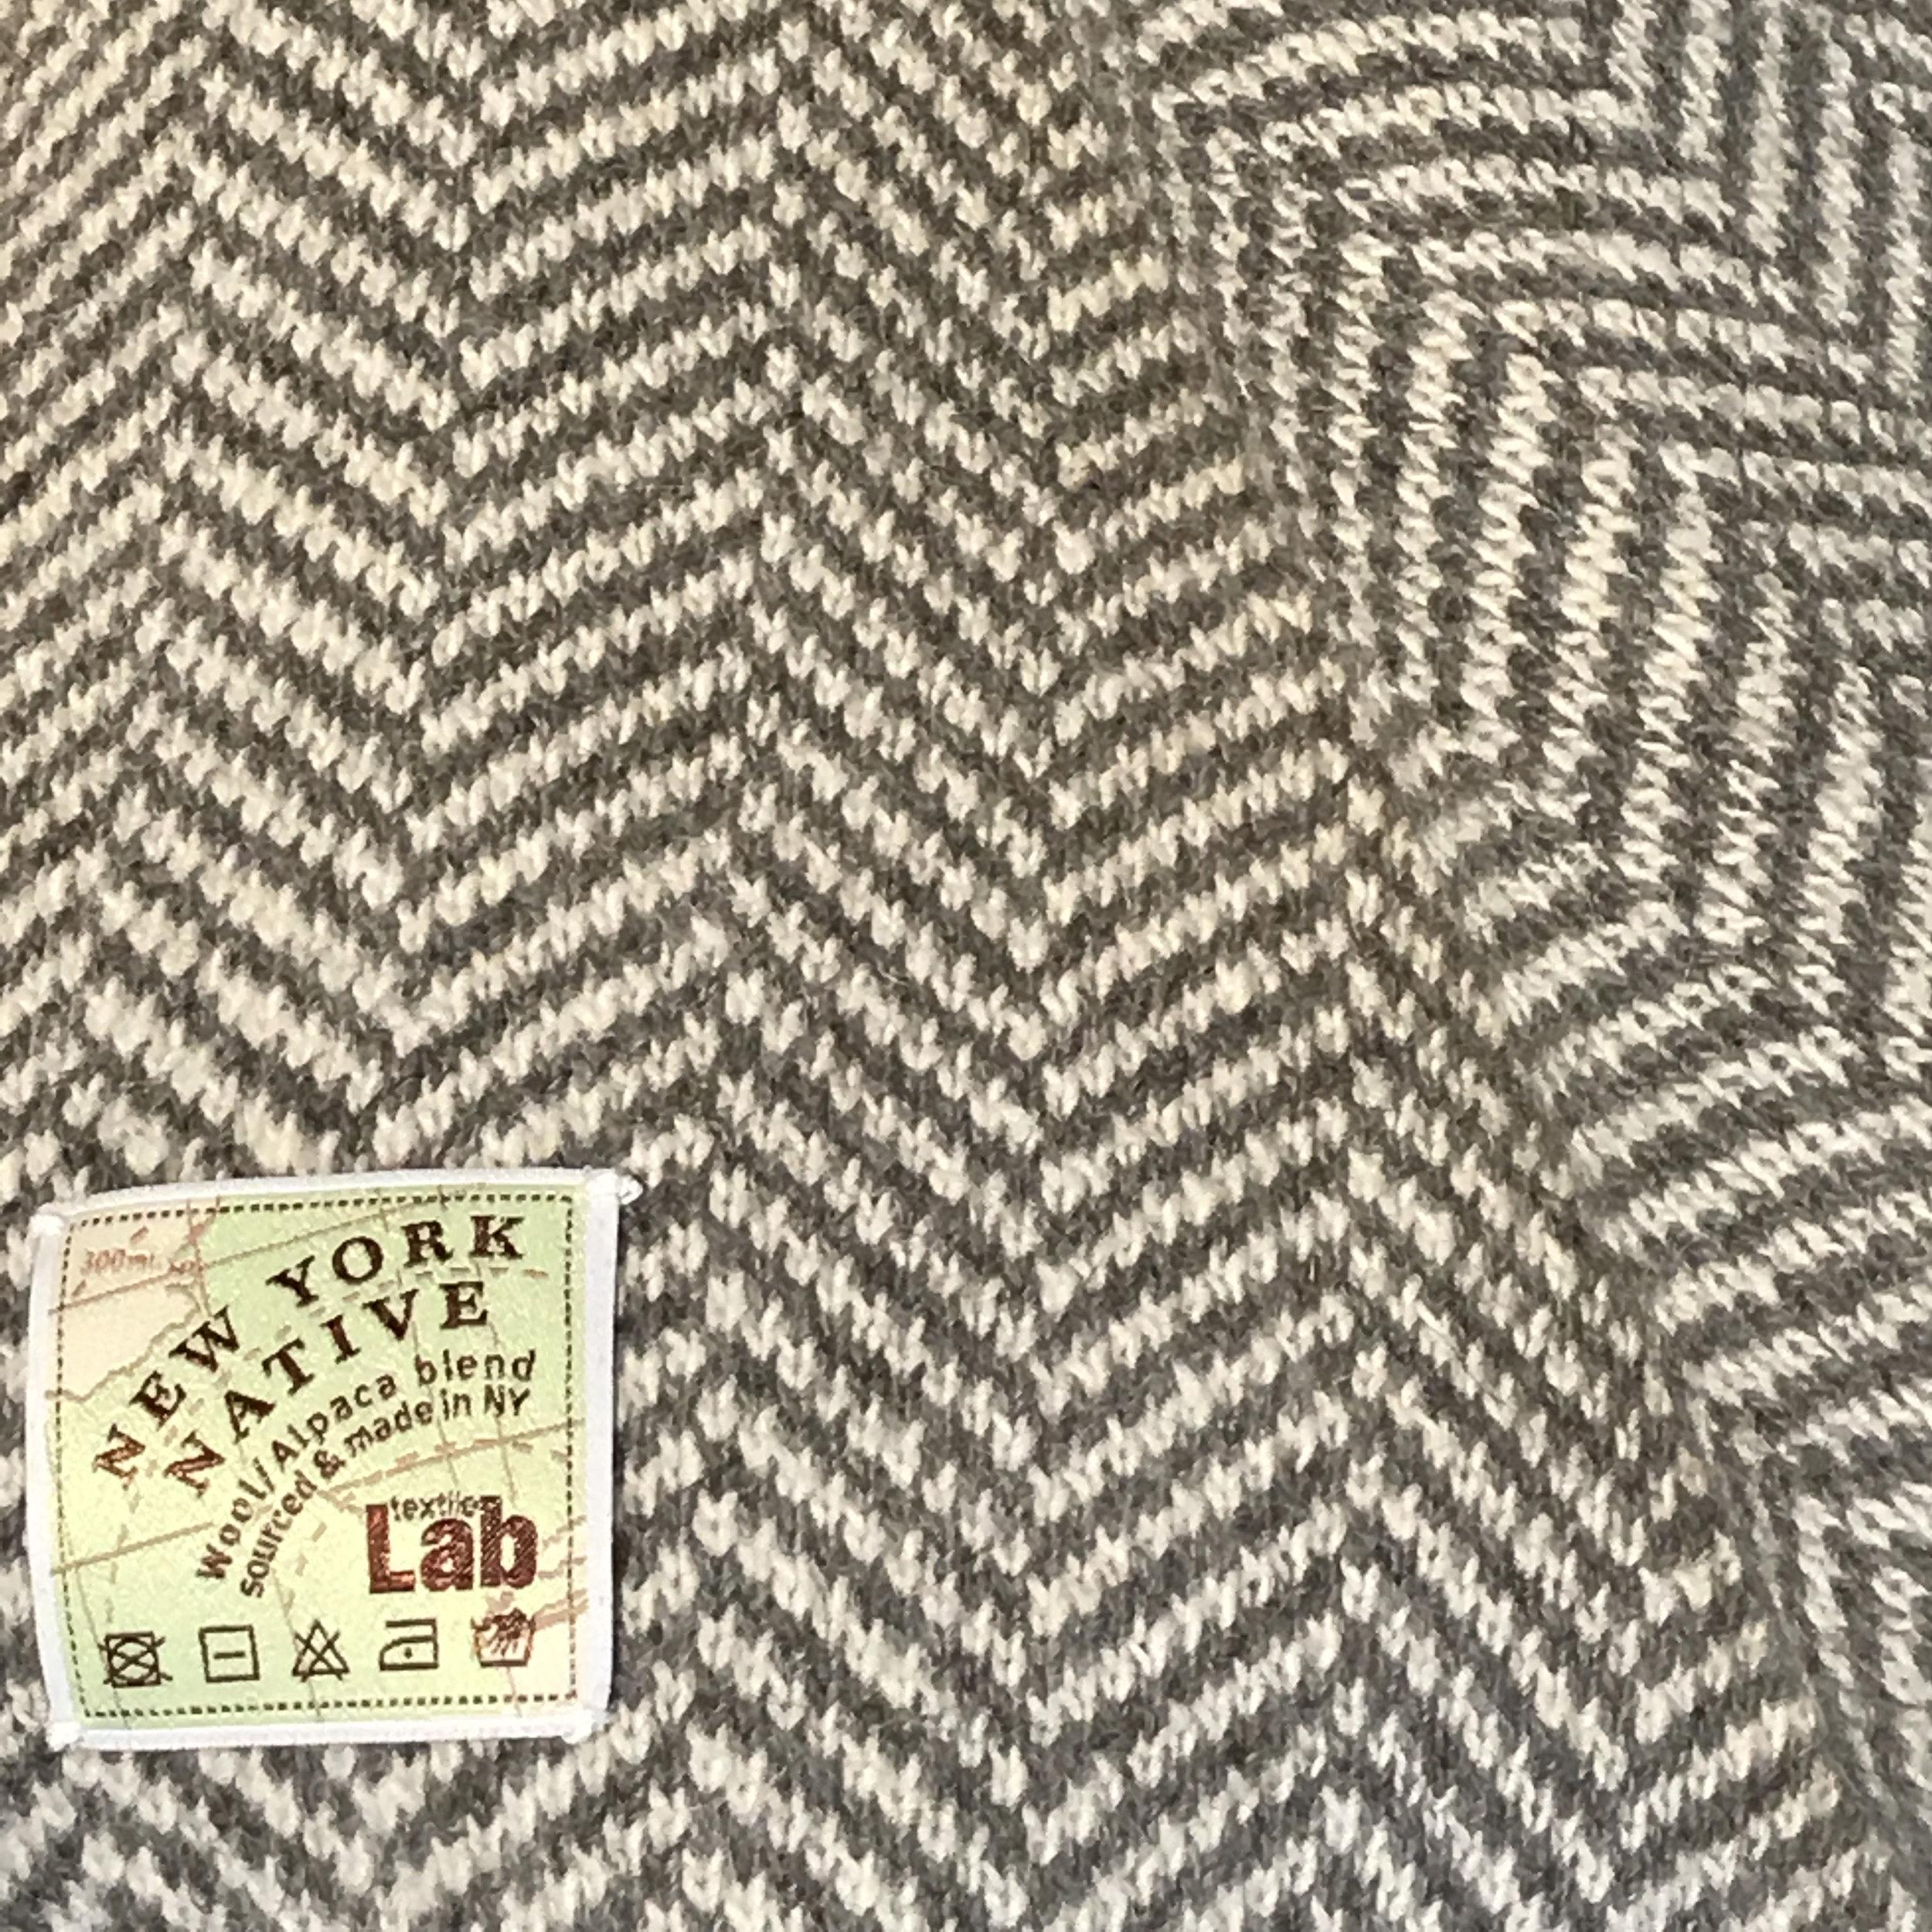 Blanket Detail.JPG